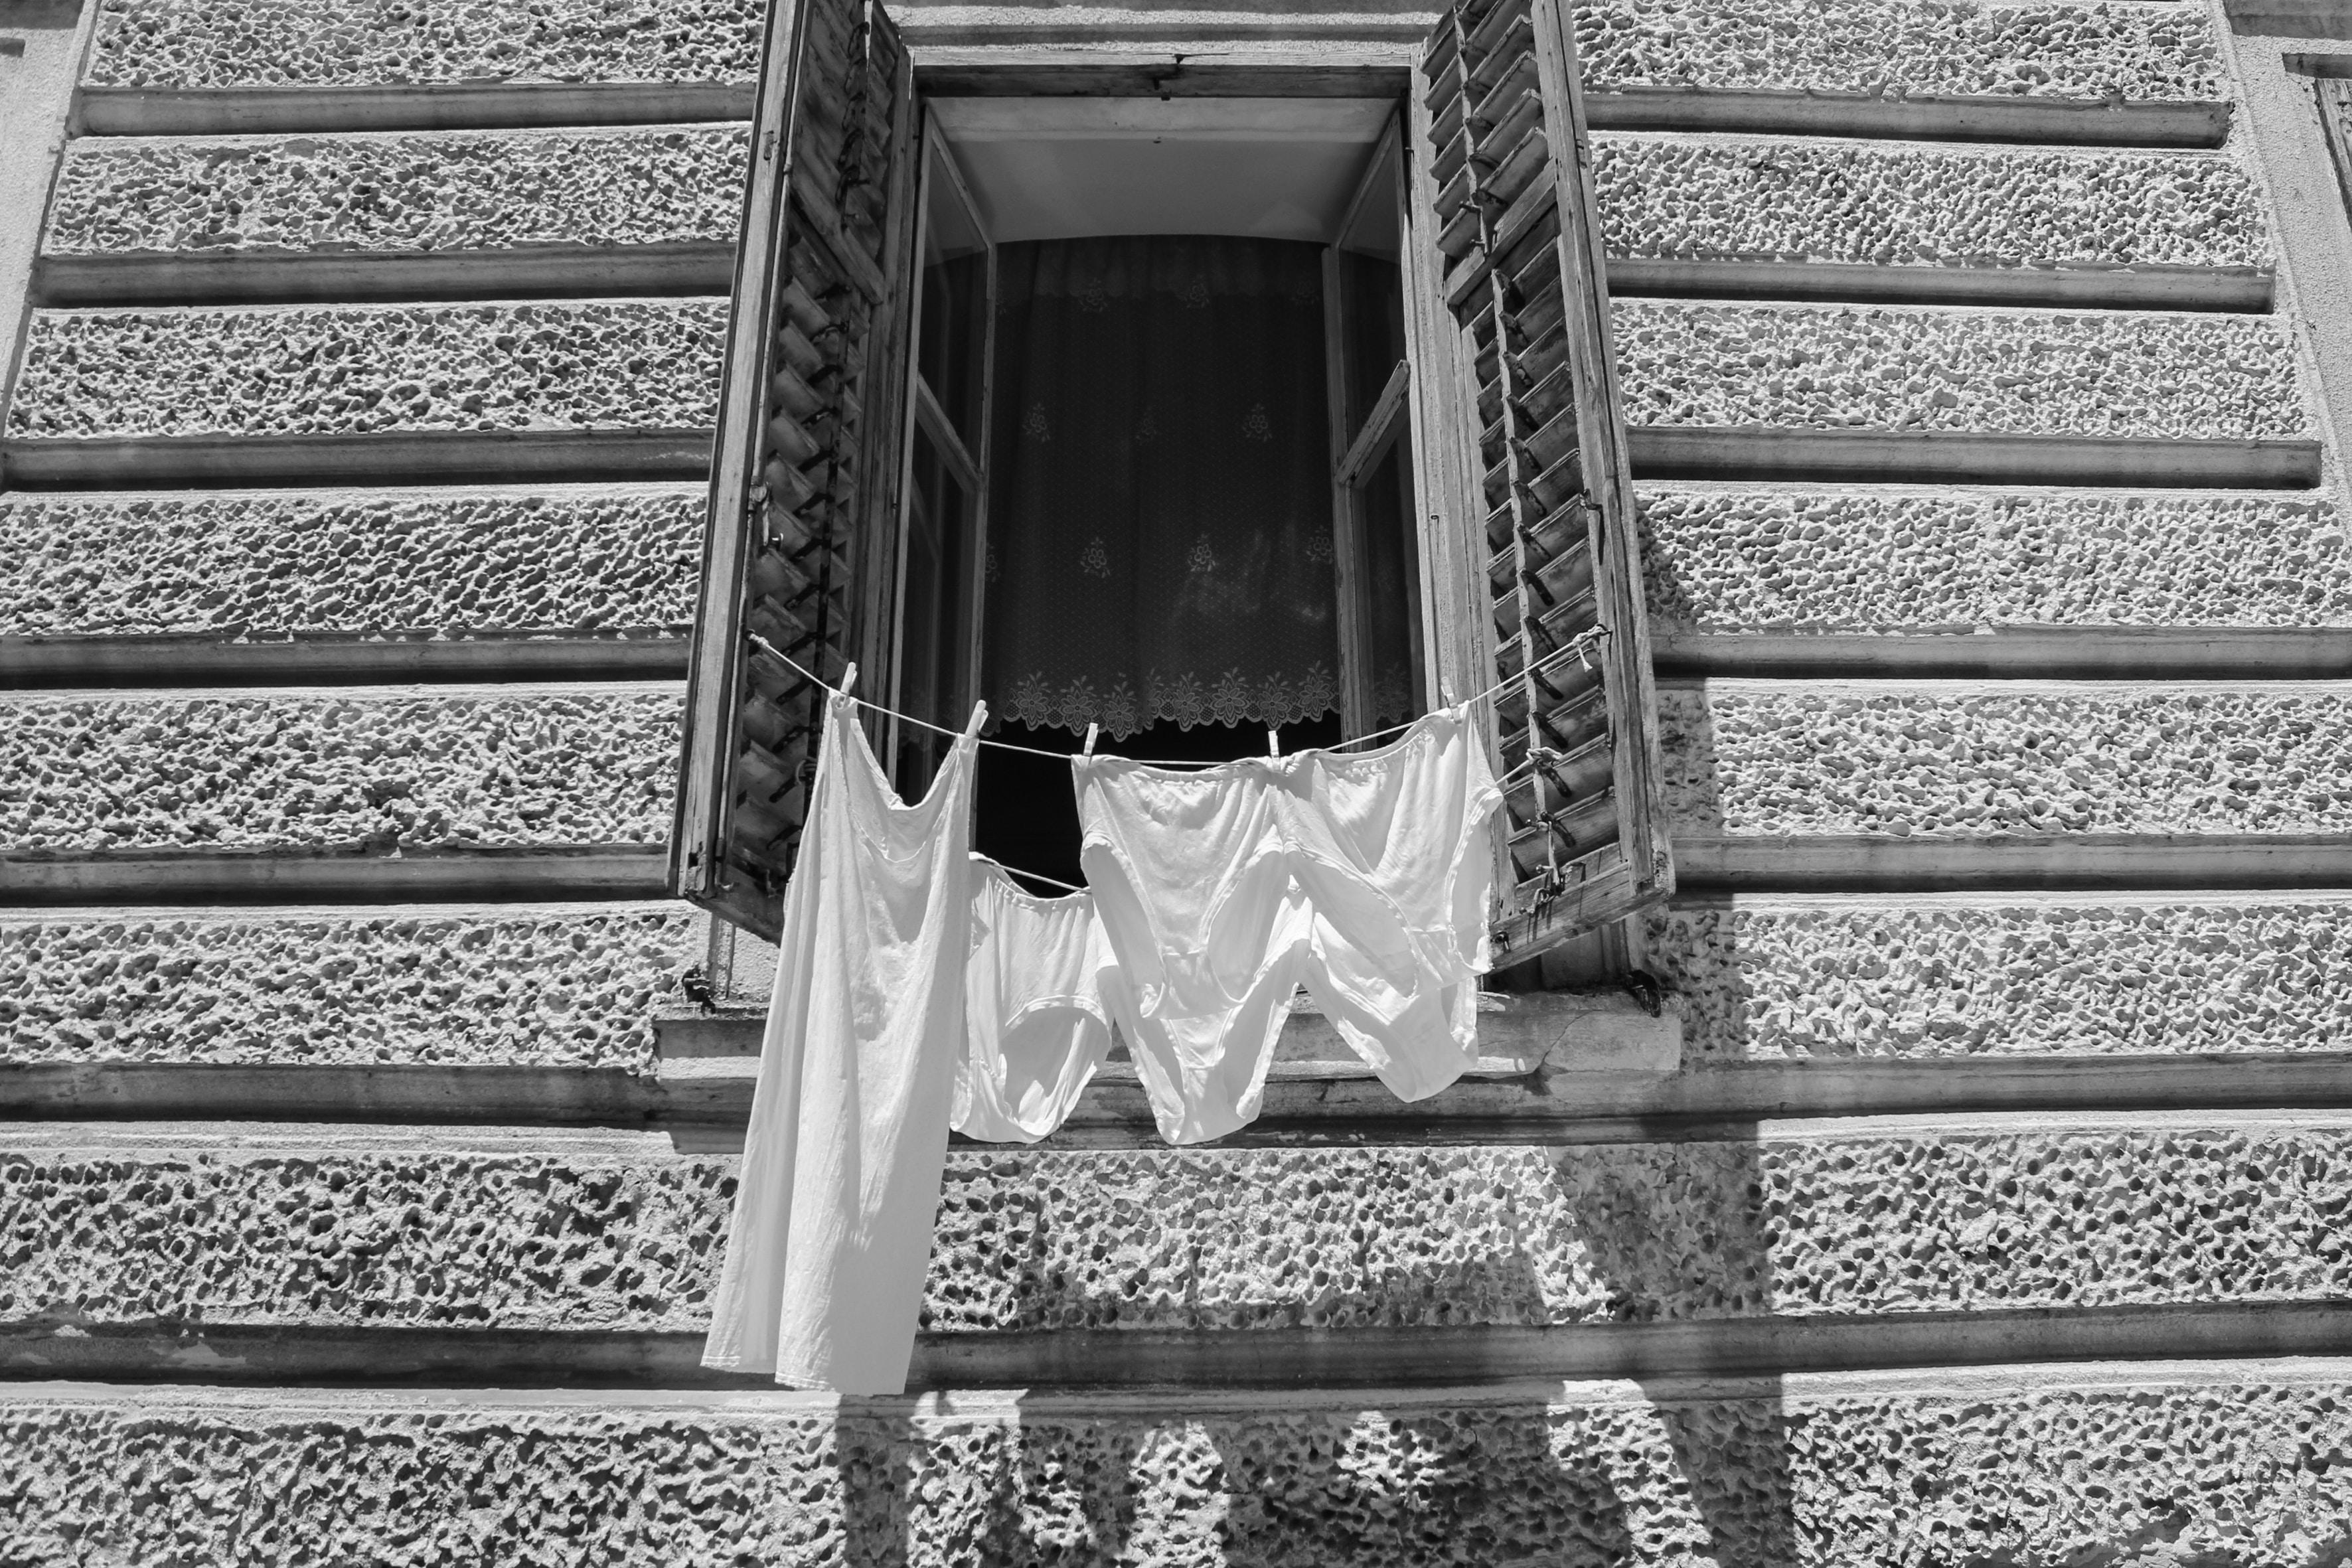 white tank top hanging on window